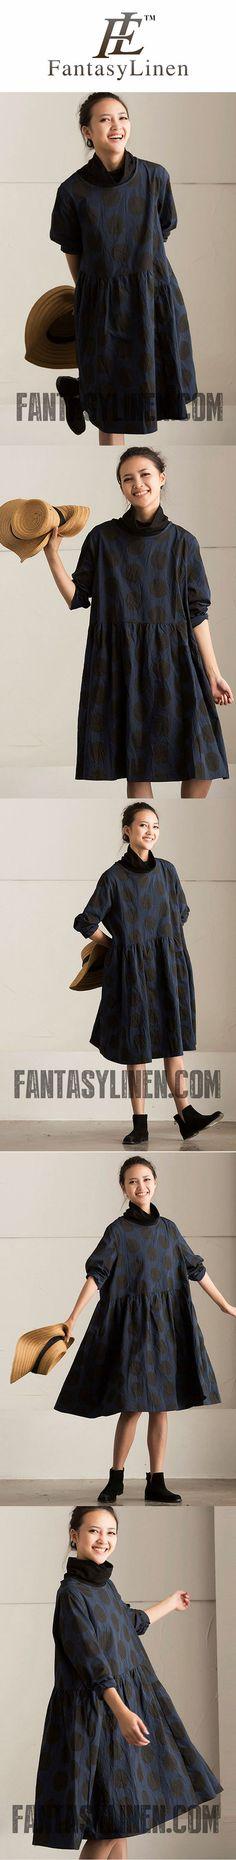 FantasyLinen Women Dot Plus Size Vintage Loose Dress, Casual Long Sleeve Dress Q5702A